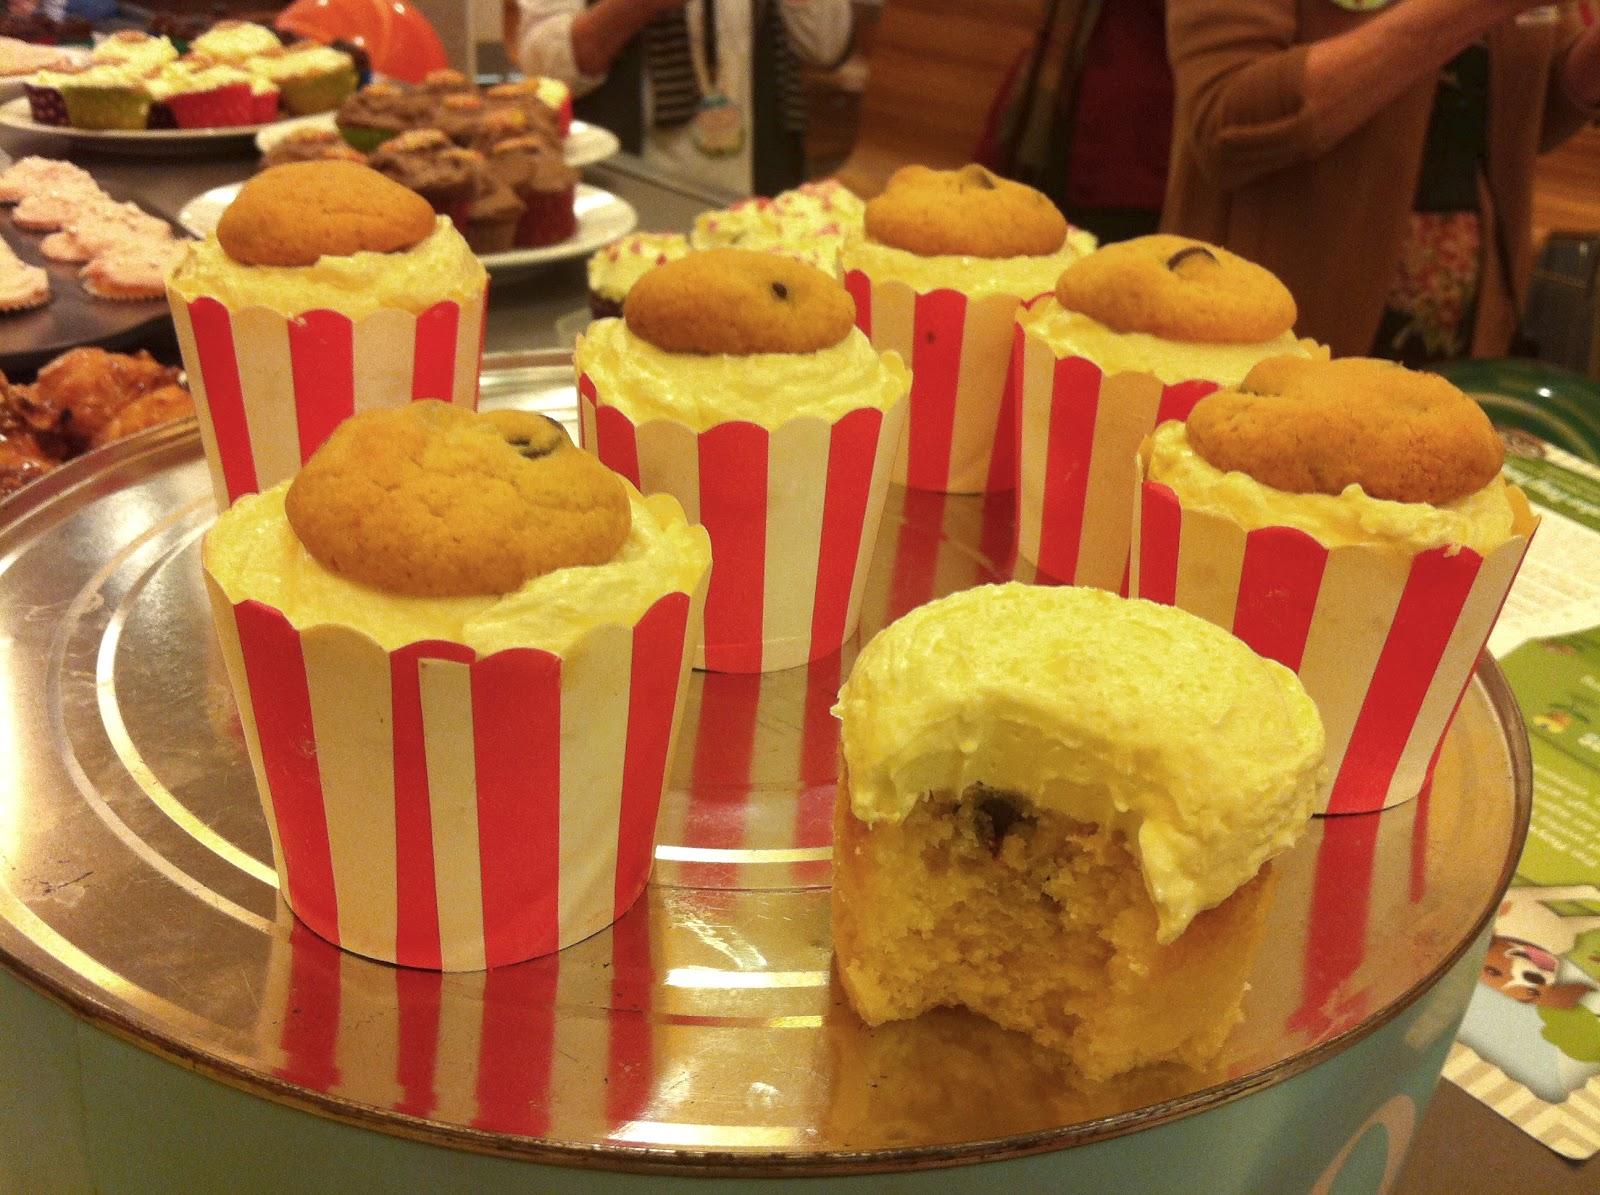 http://weekend-mummy.blogspot.com.au/2012/08/happy-rspca-cupcake-day.html